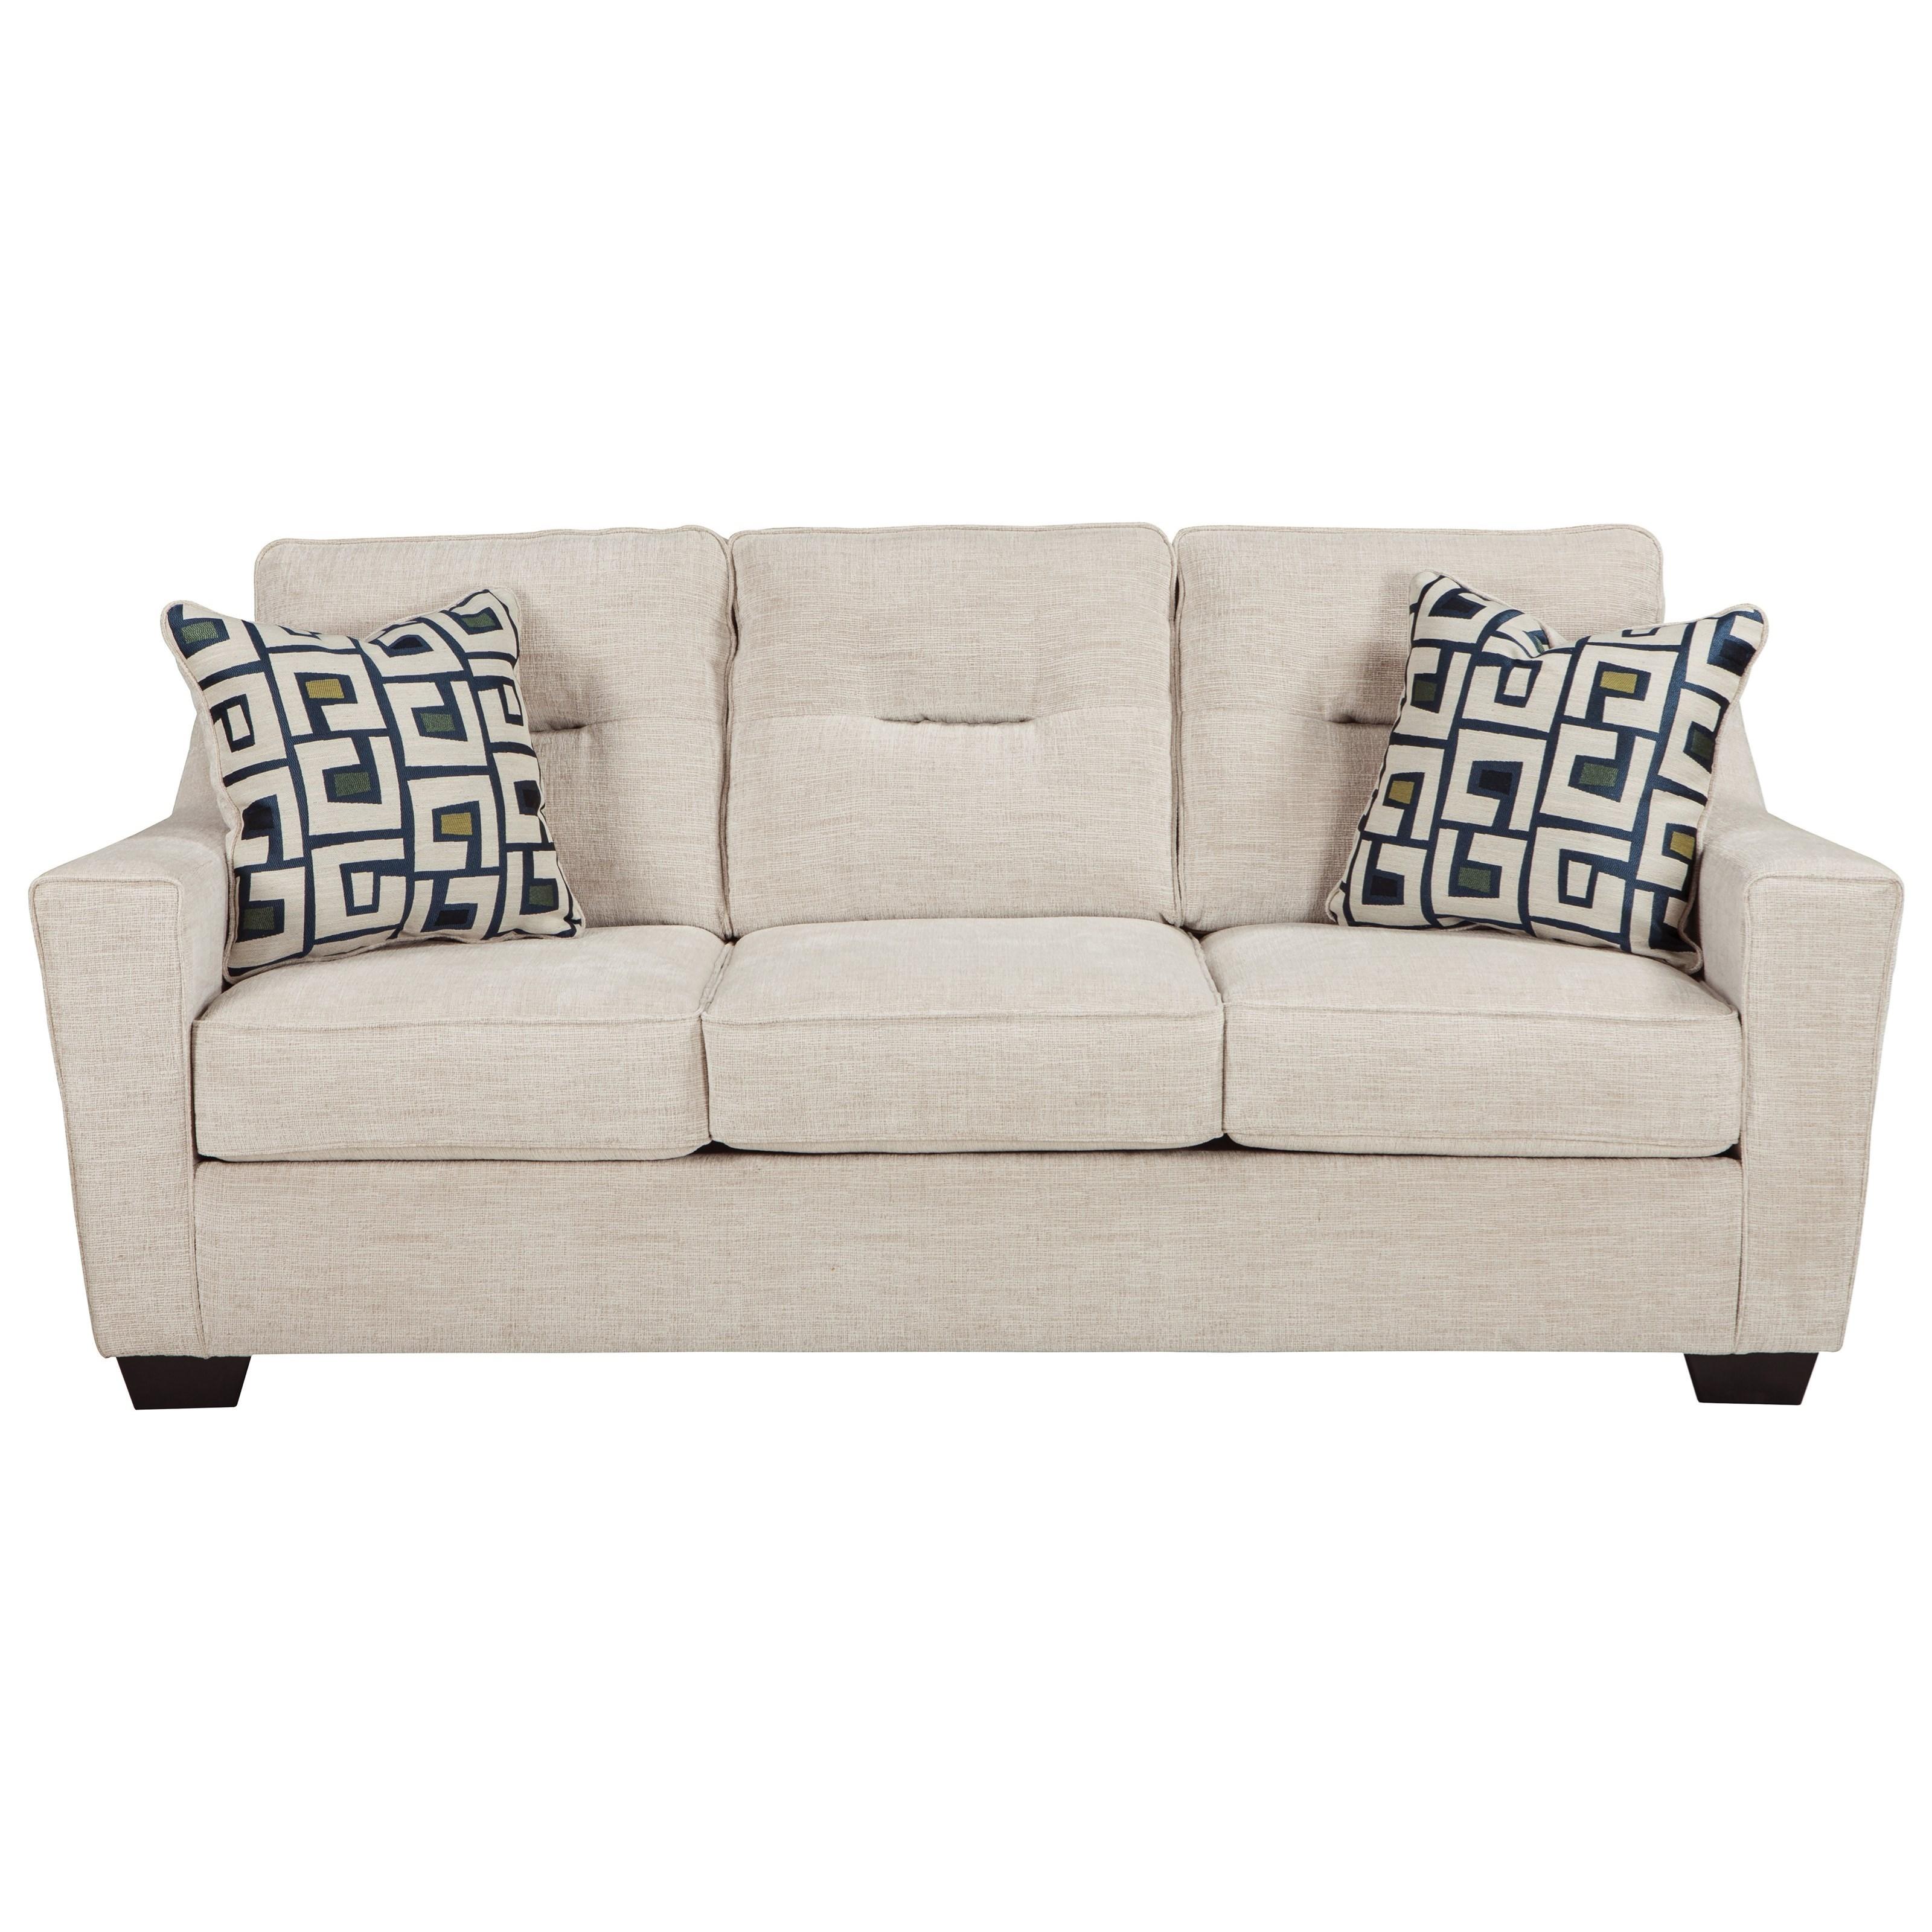 ashley furniture cerdic queen sofa sleeper with memory foam mattress household furniture sleeper sofas - Queen Sofa Sleeper